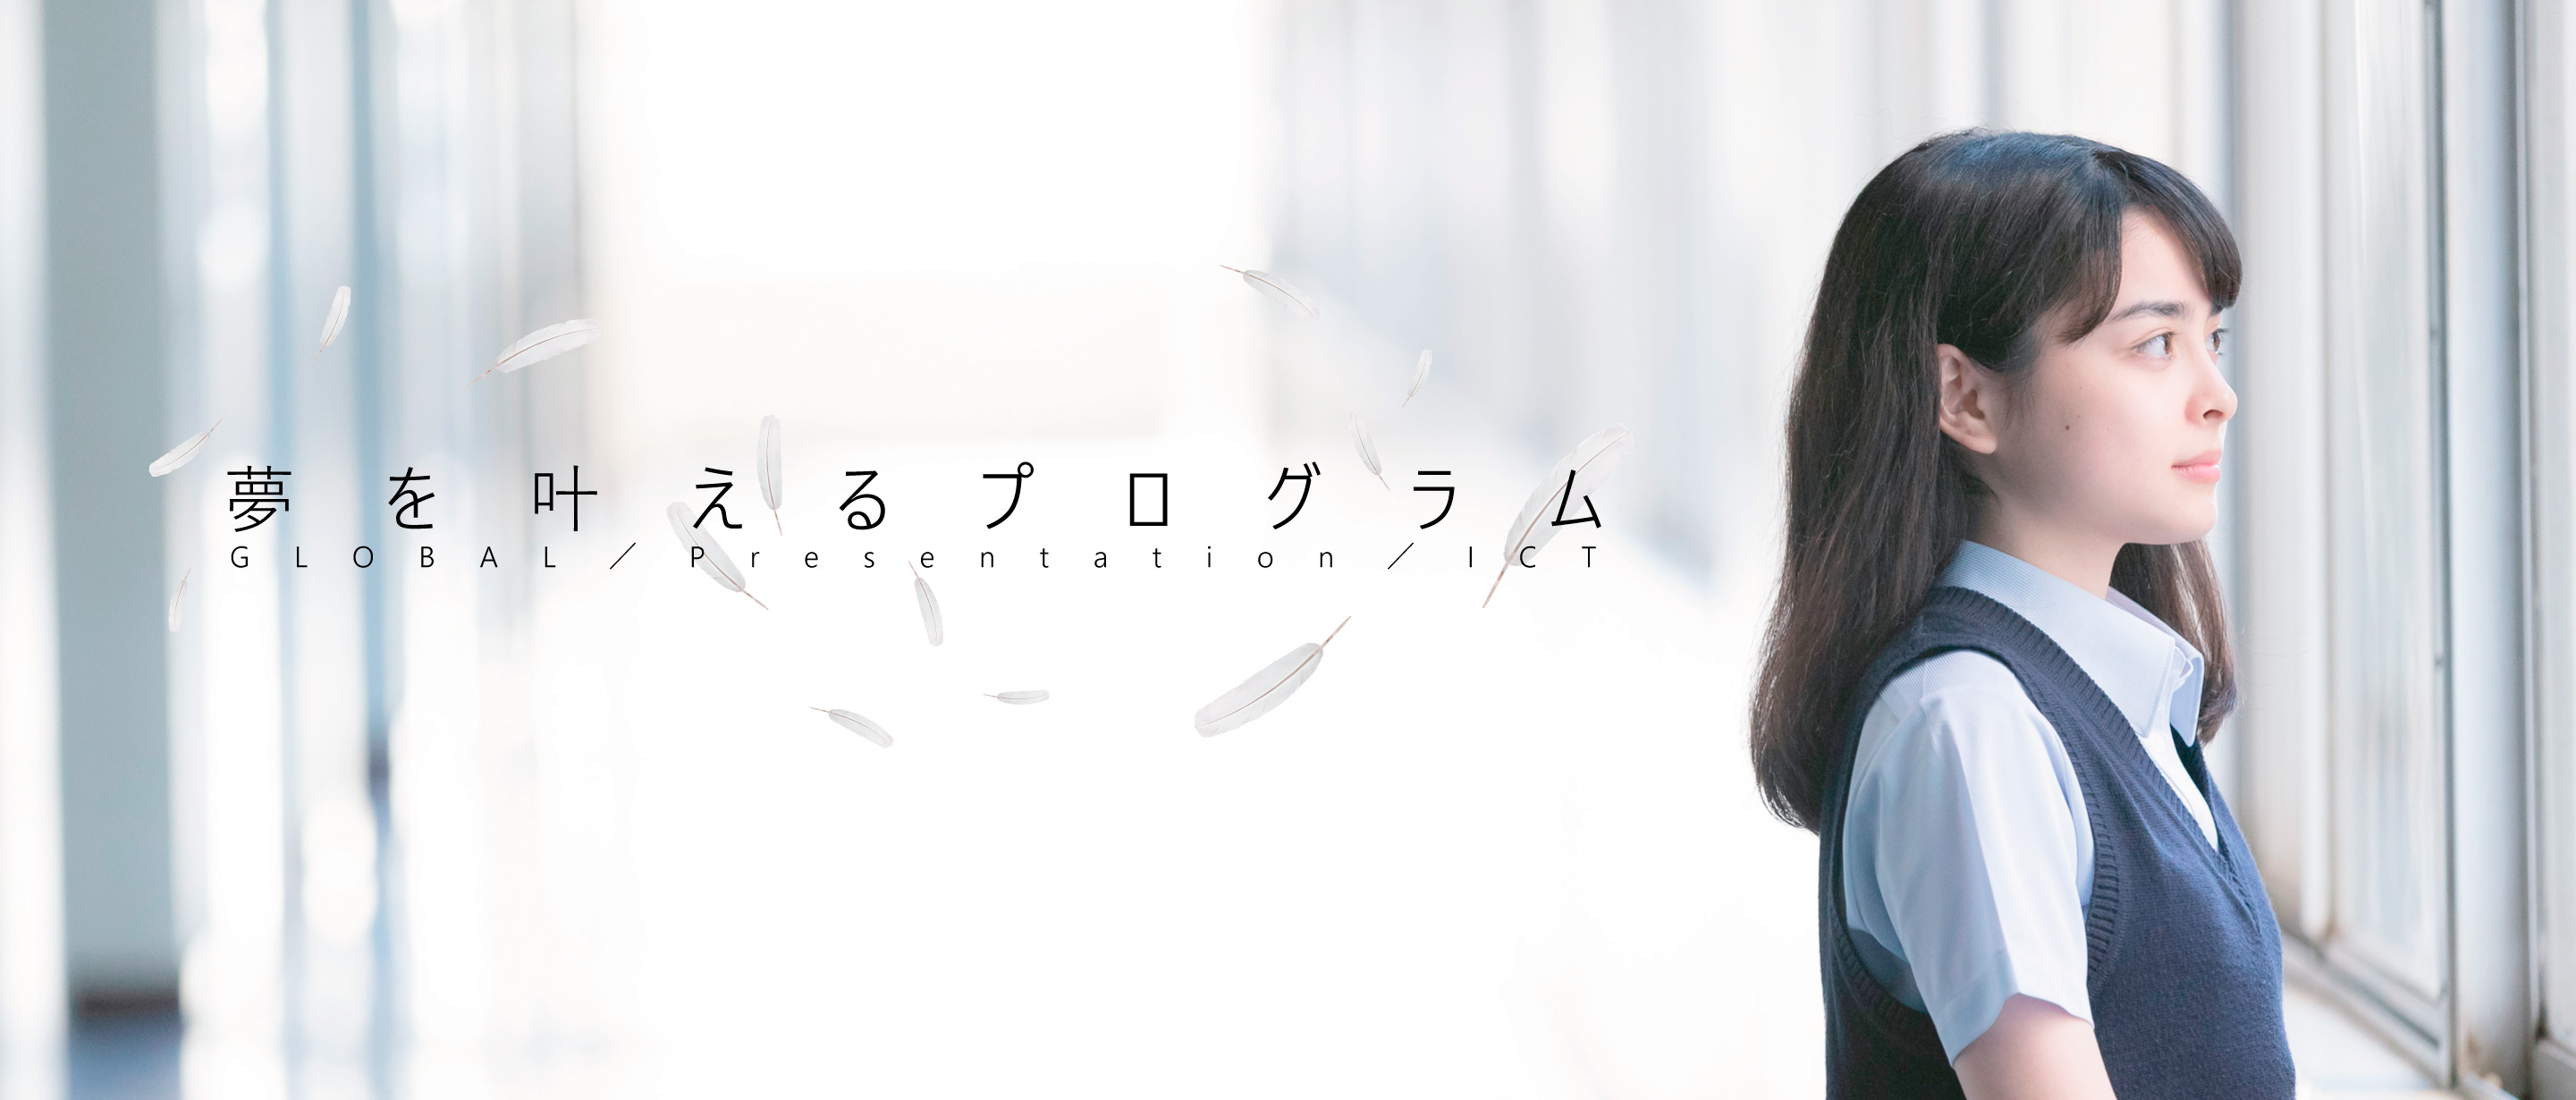 H_image_05_02.jpg